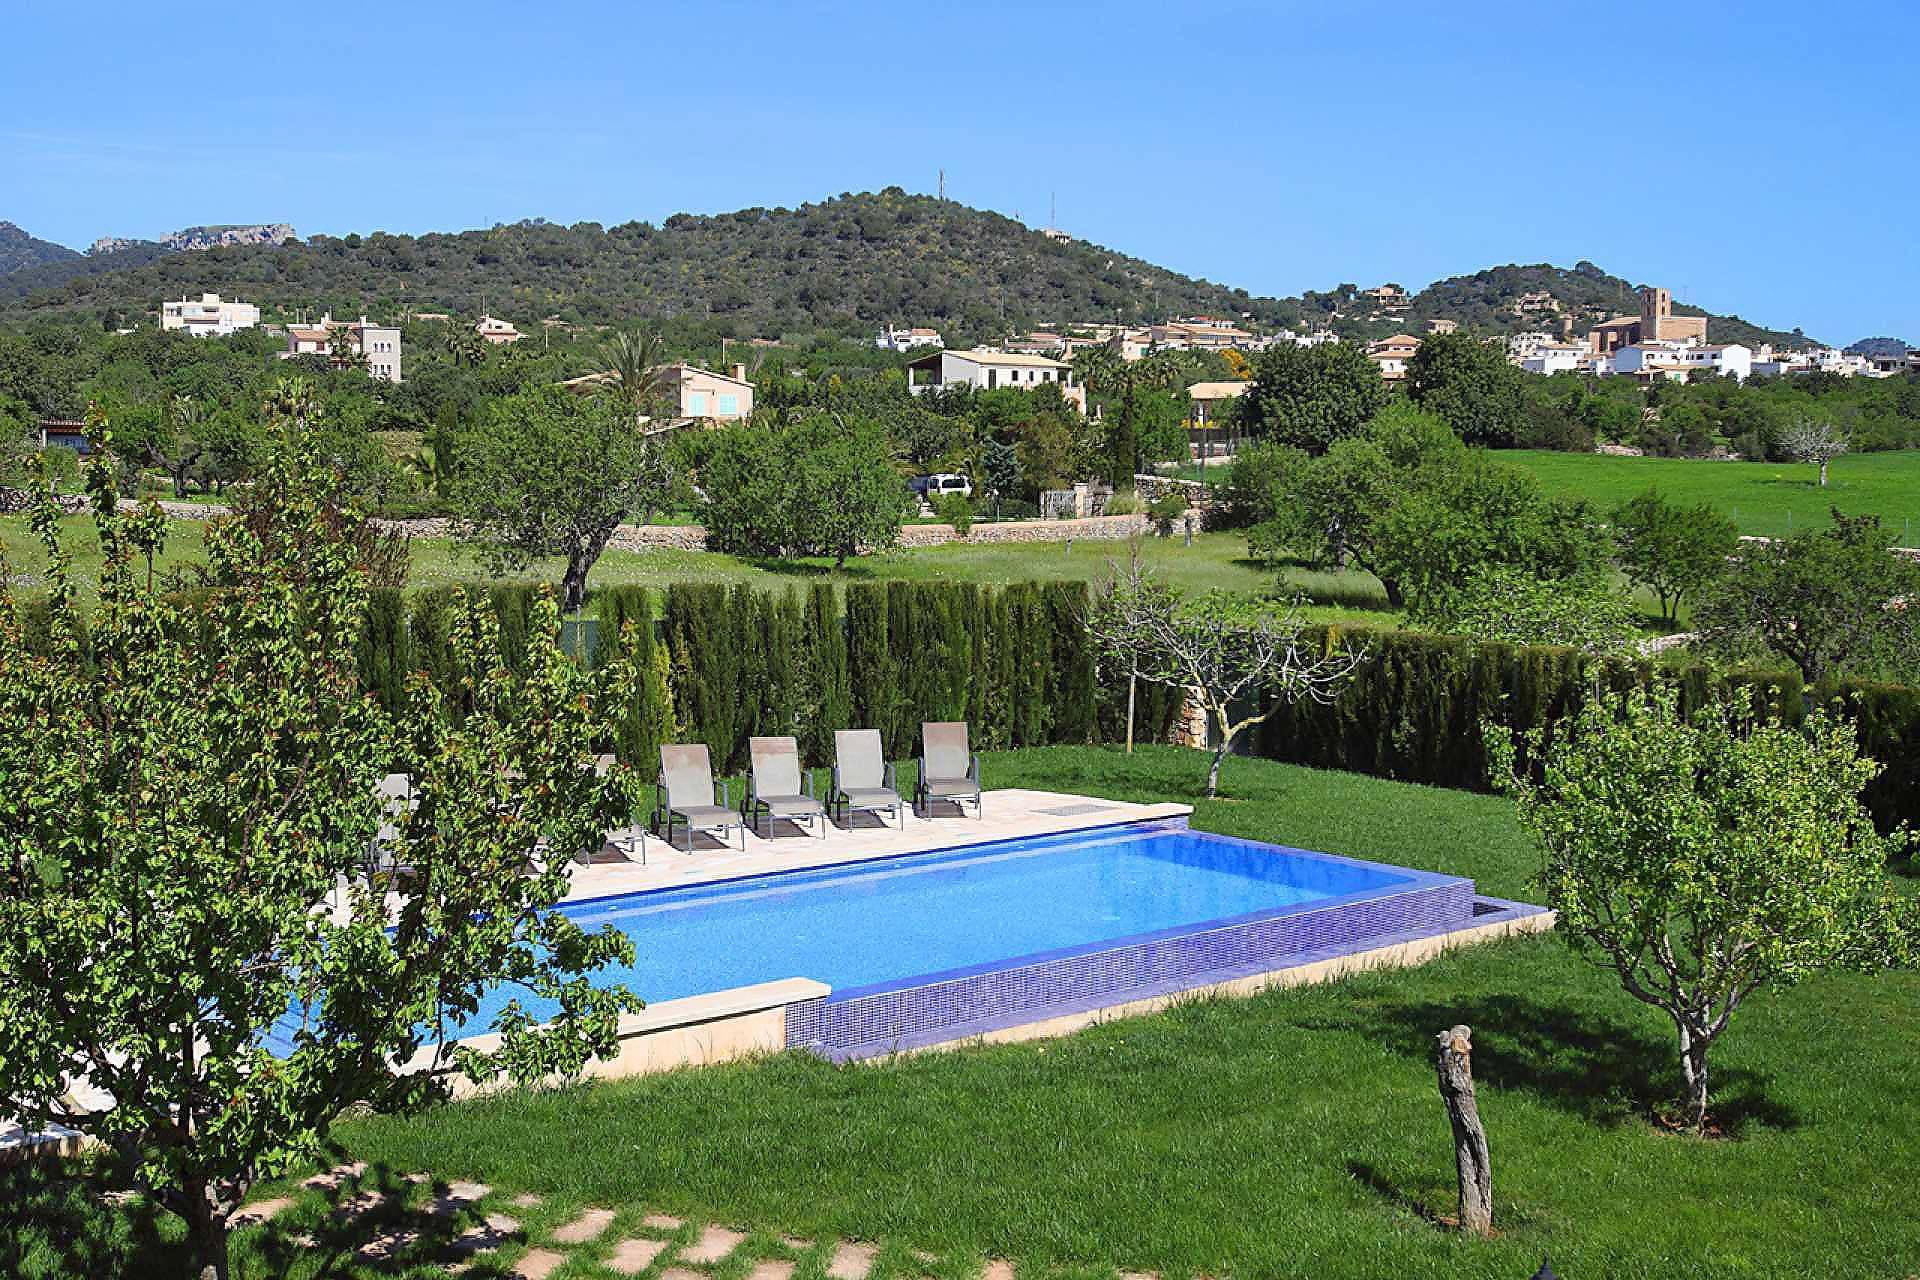 01-33 Spacious holiday home Mallorca East Bild 4